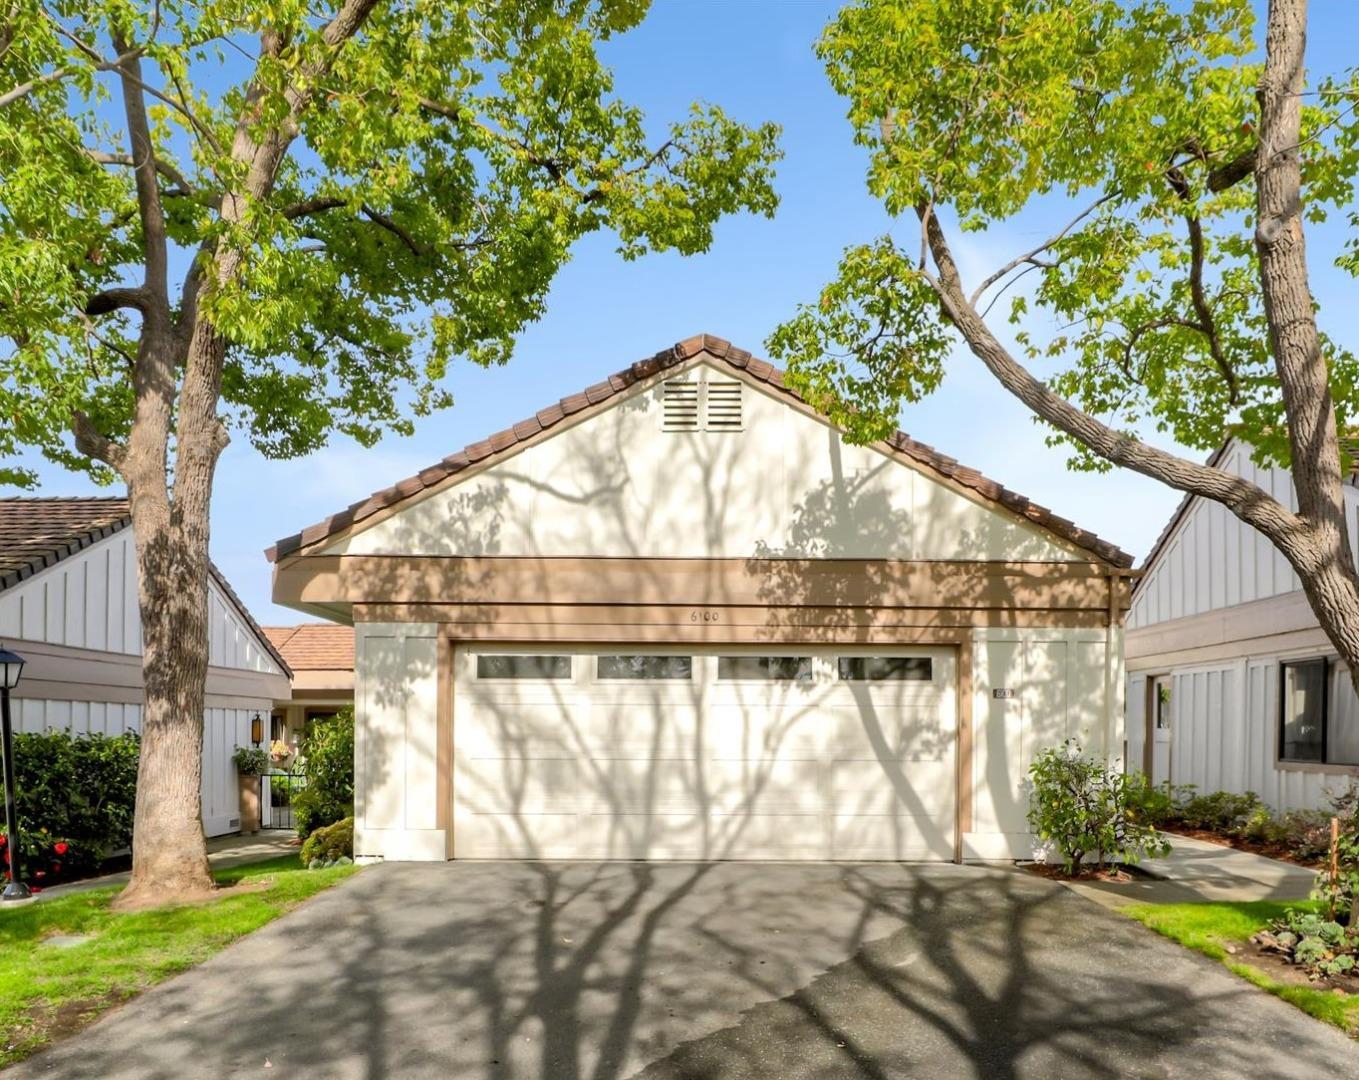 6100 Montgomery Court, Evergreen in Santa Clara County, CA 95135 Home for Sale